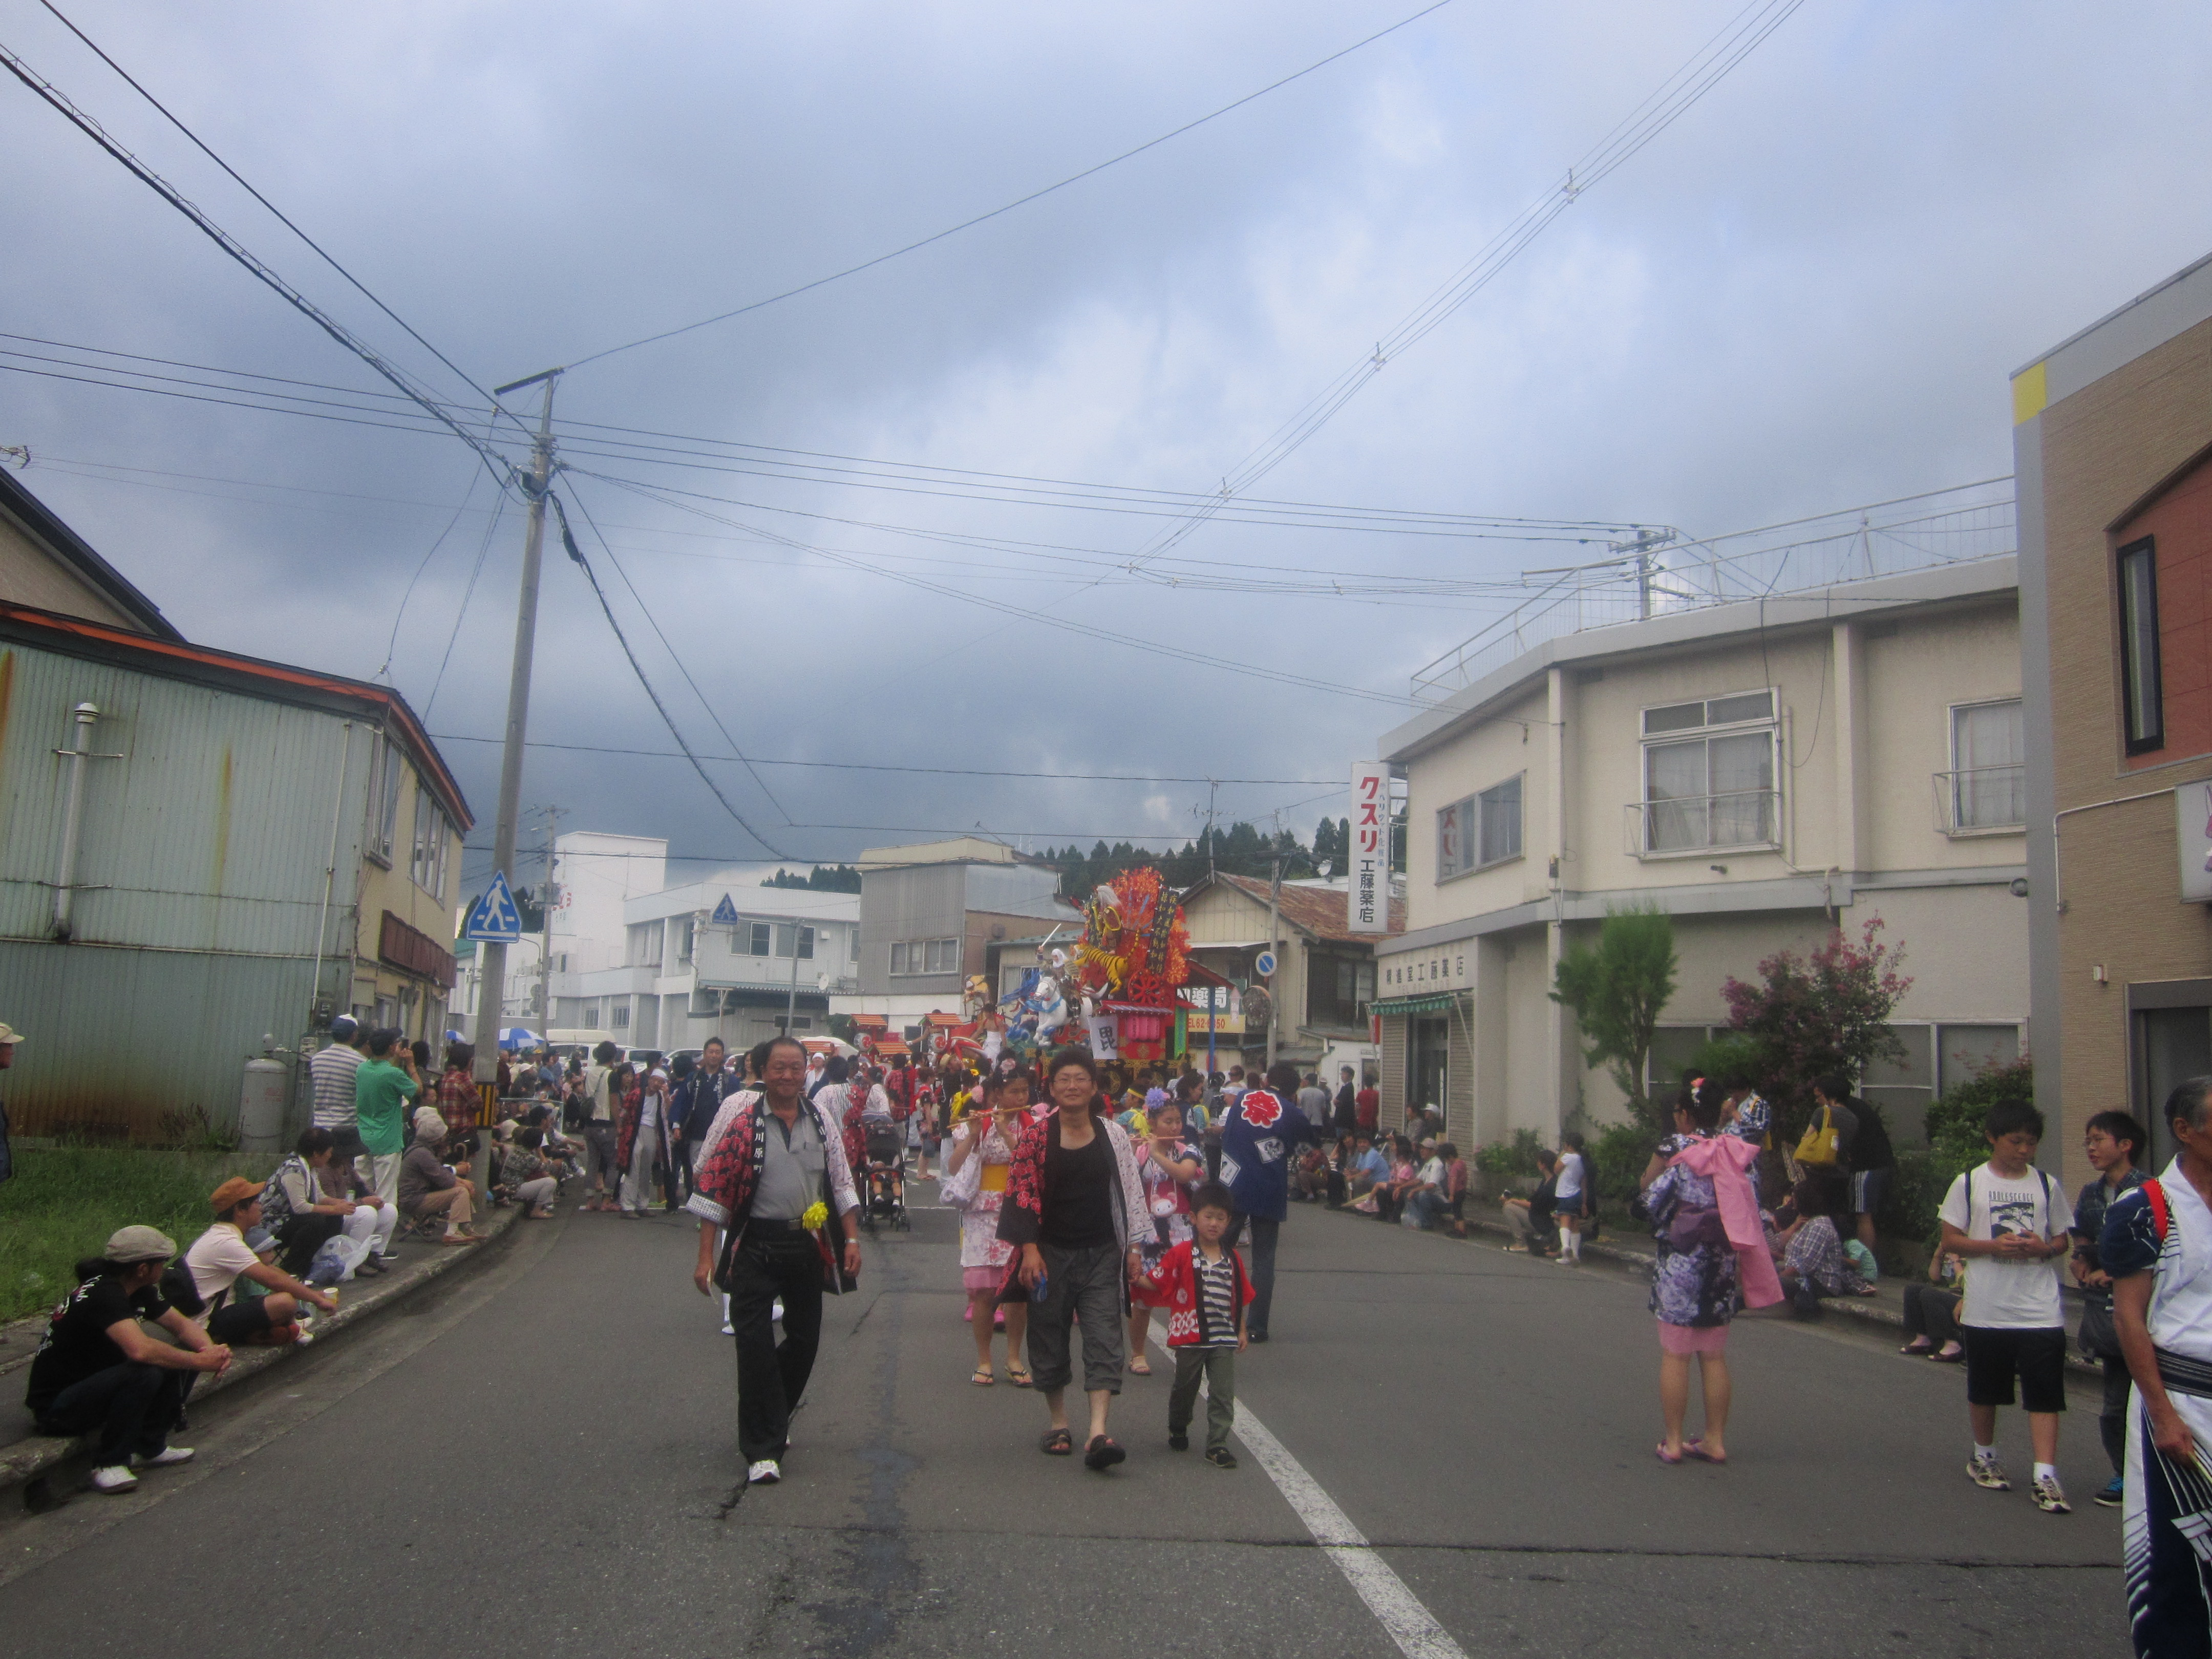 IMG 4253 - 麻布十番納涼祭り25,26日(七戸町出店)